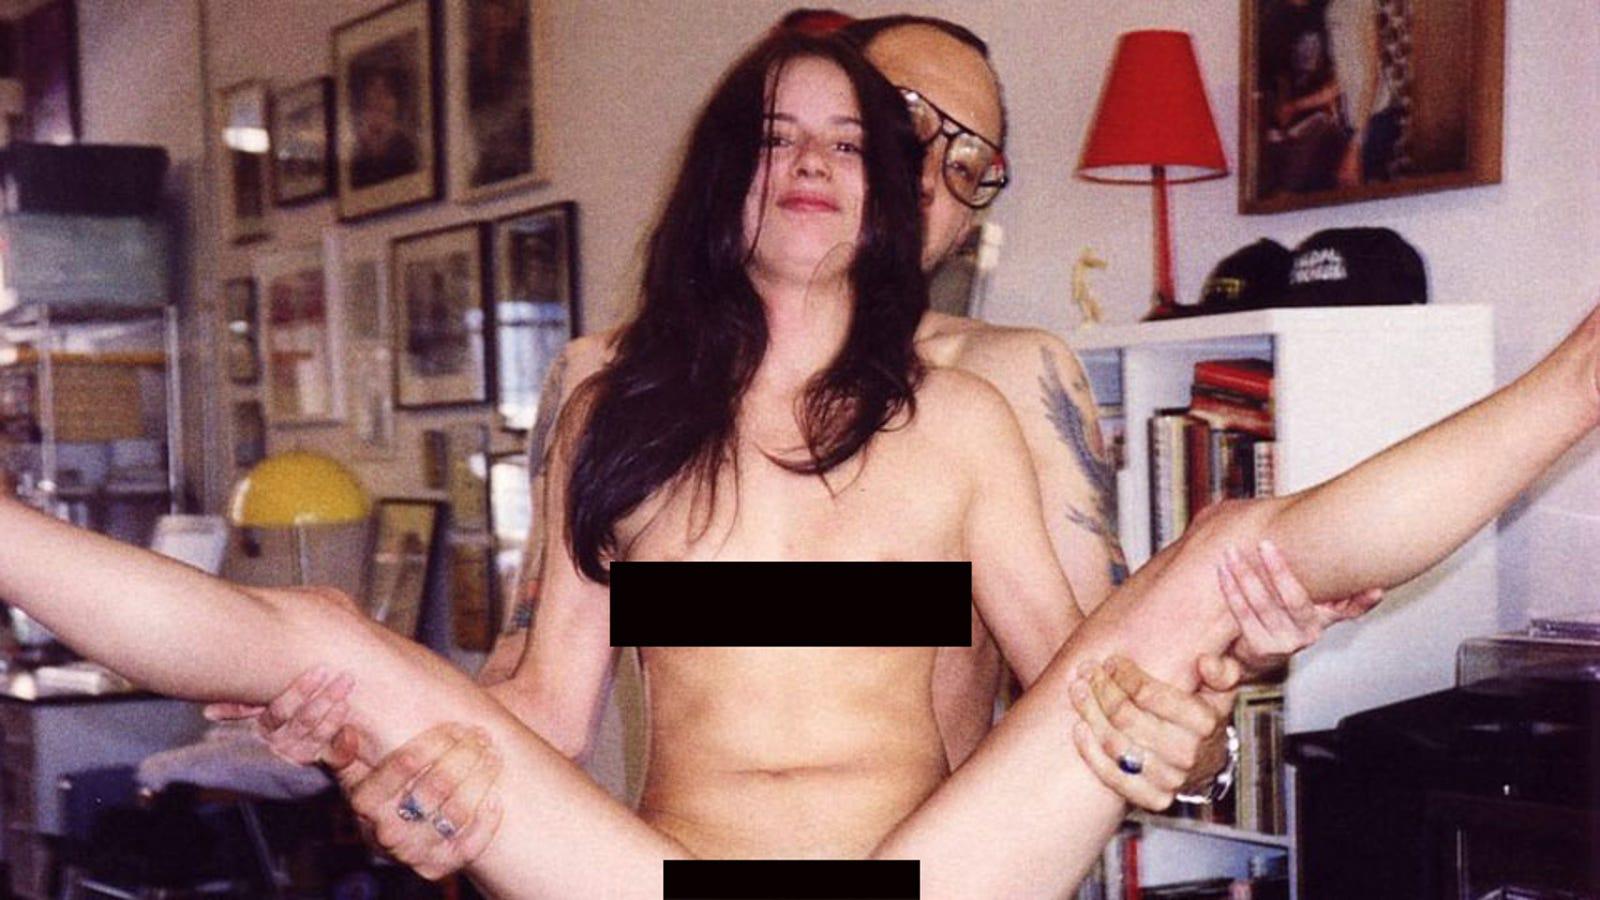 Imogen pools nude pics